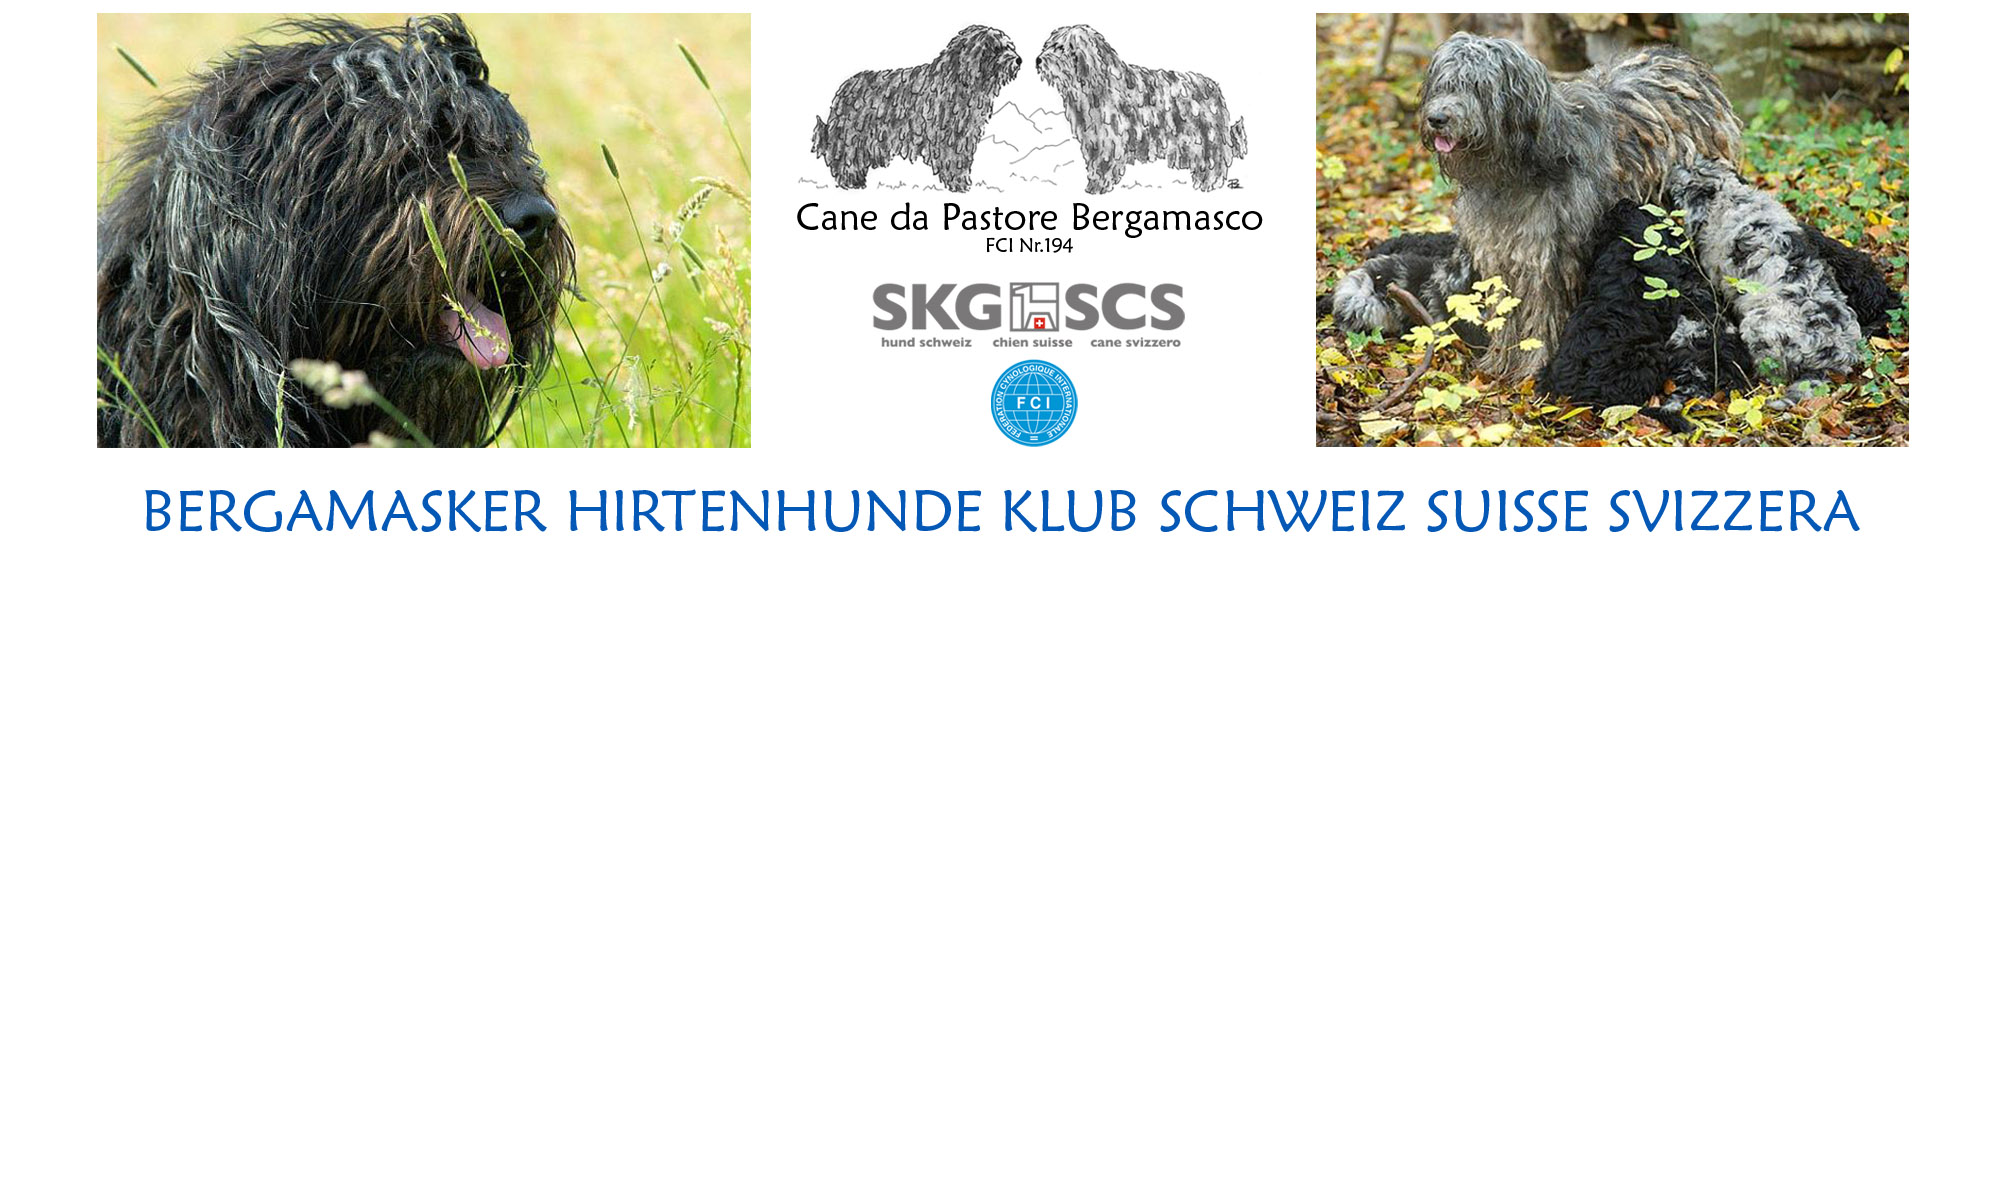 Bergamasker Hirtenhunde Klub Schweiz